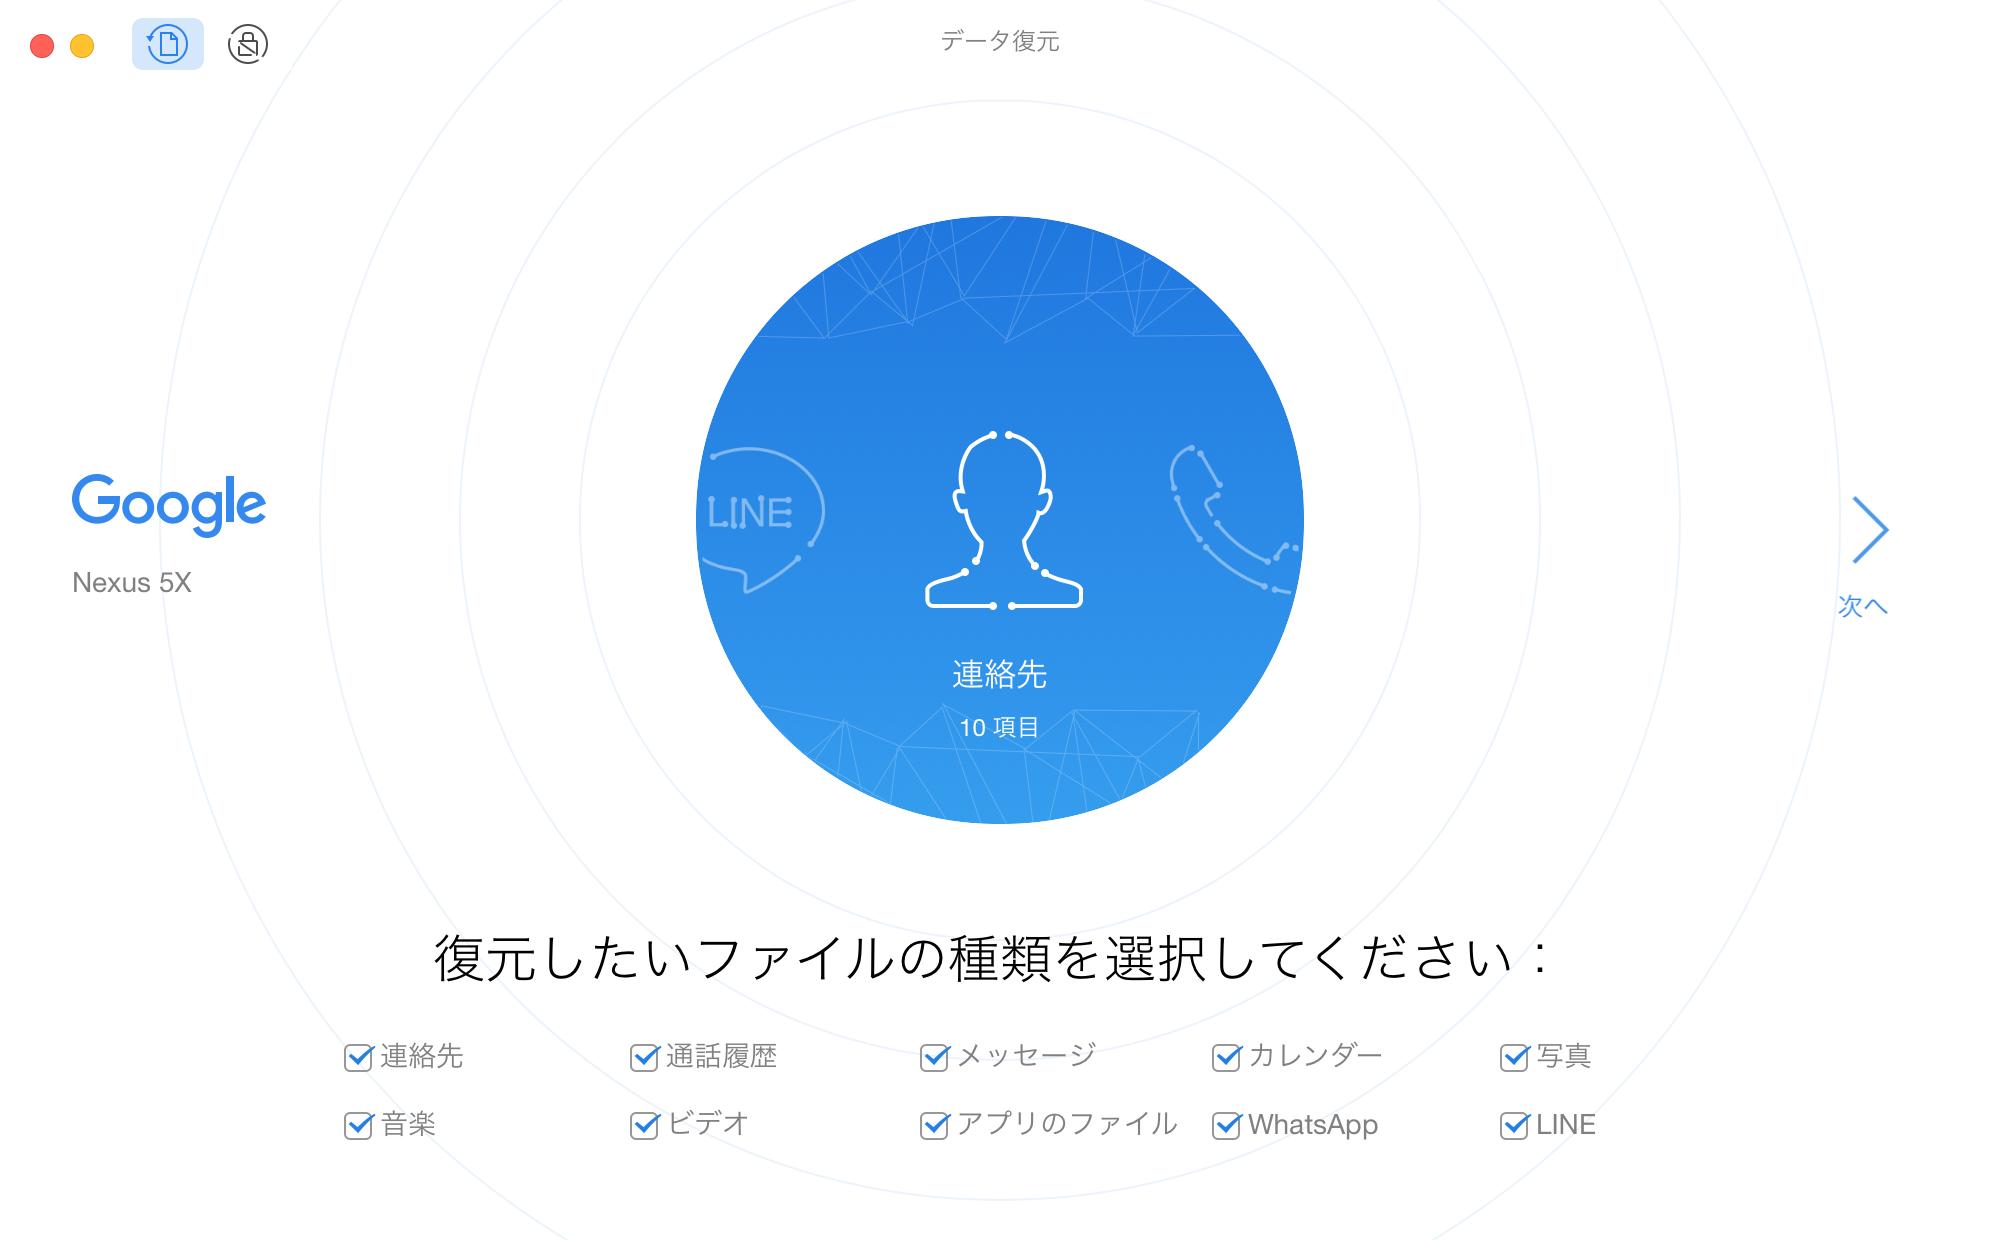 PhoneRescue - Googleデータ復元のインターフェース